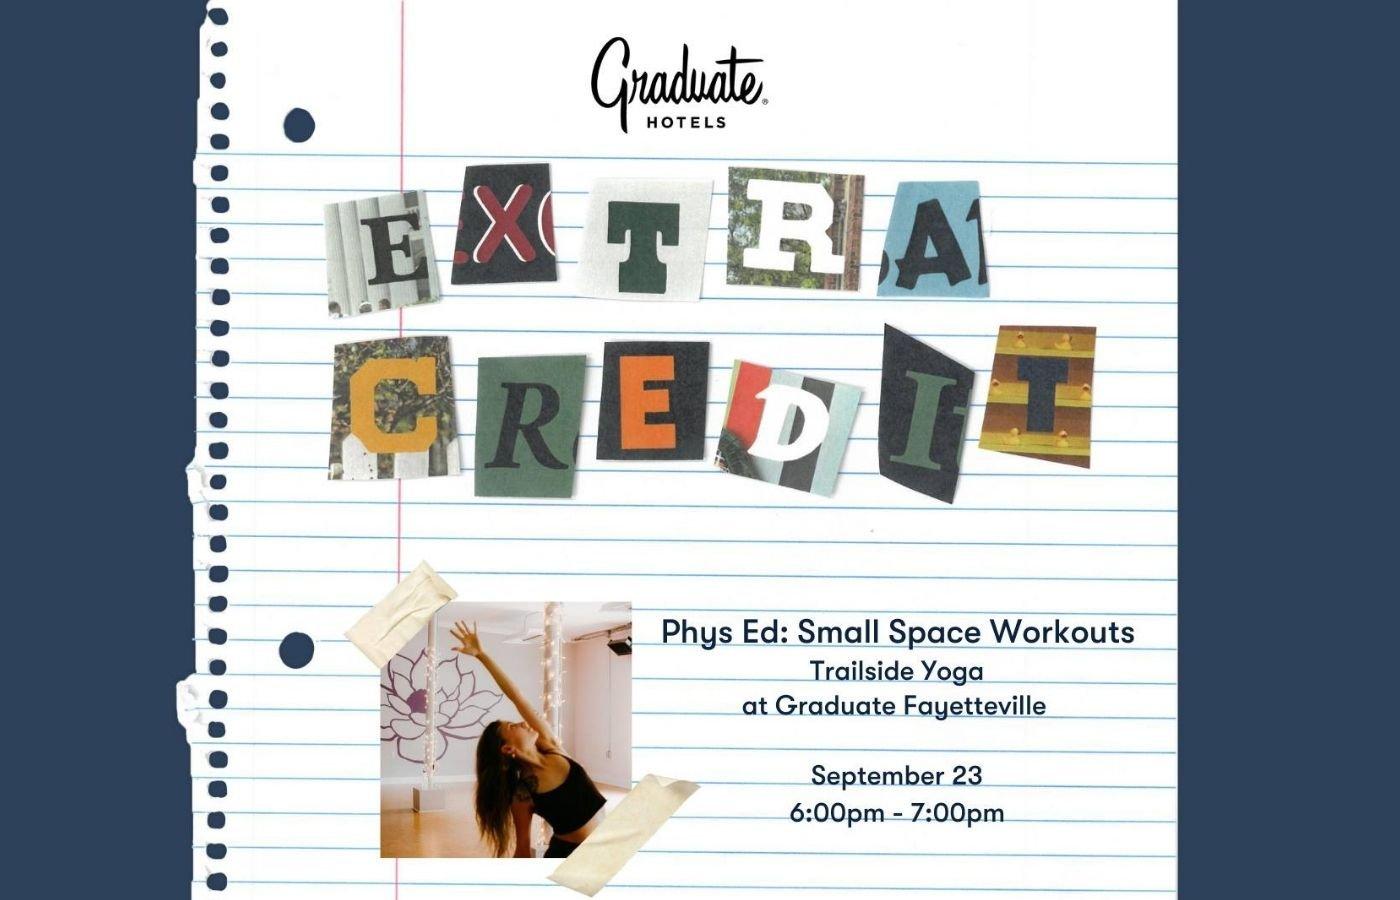 Trailside Yoga at Graduate Fayetteville